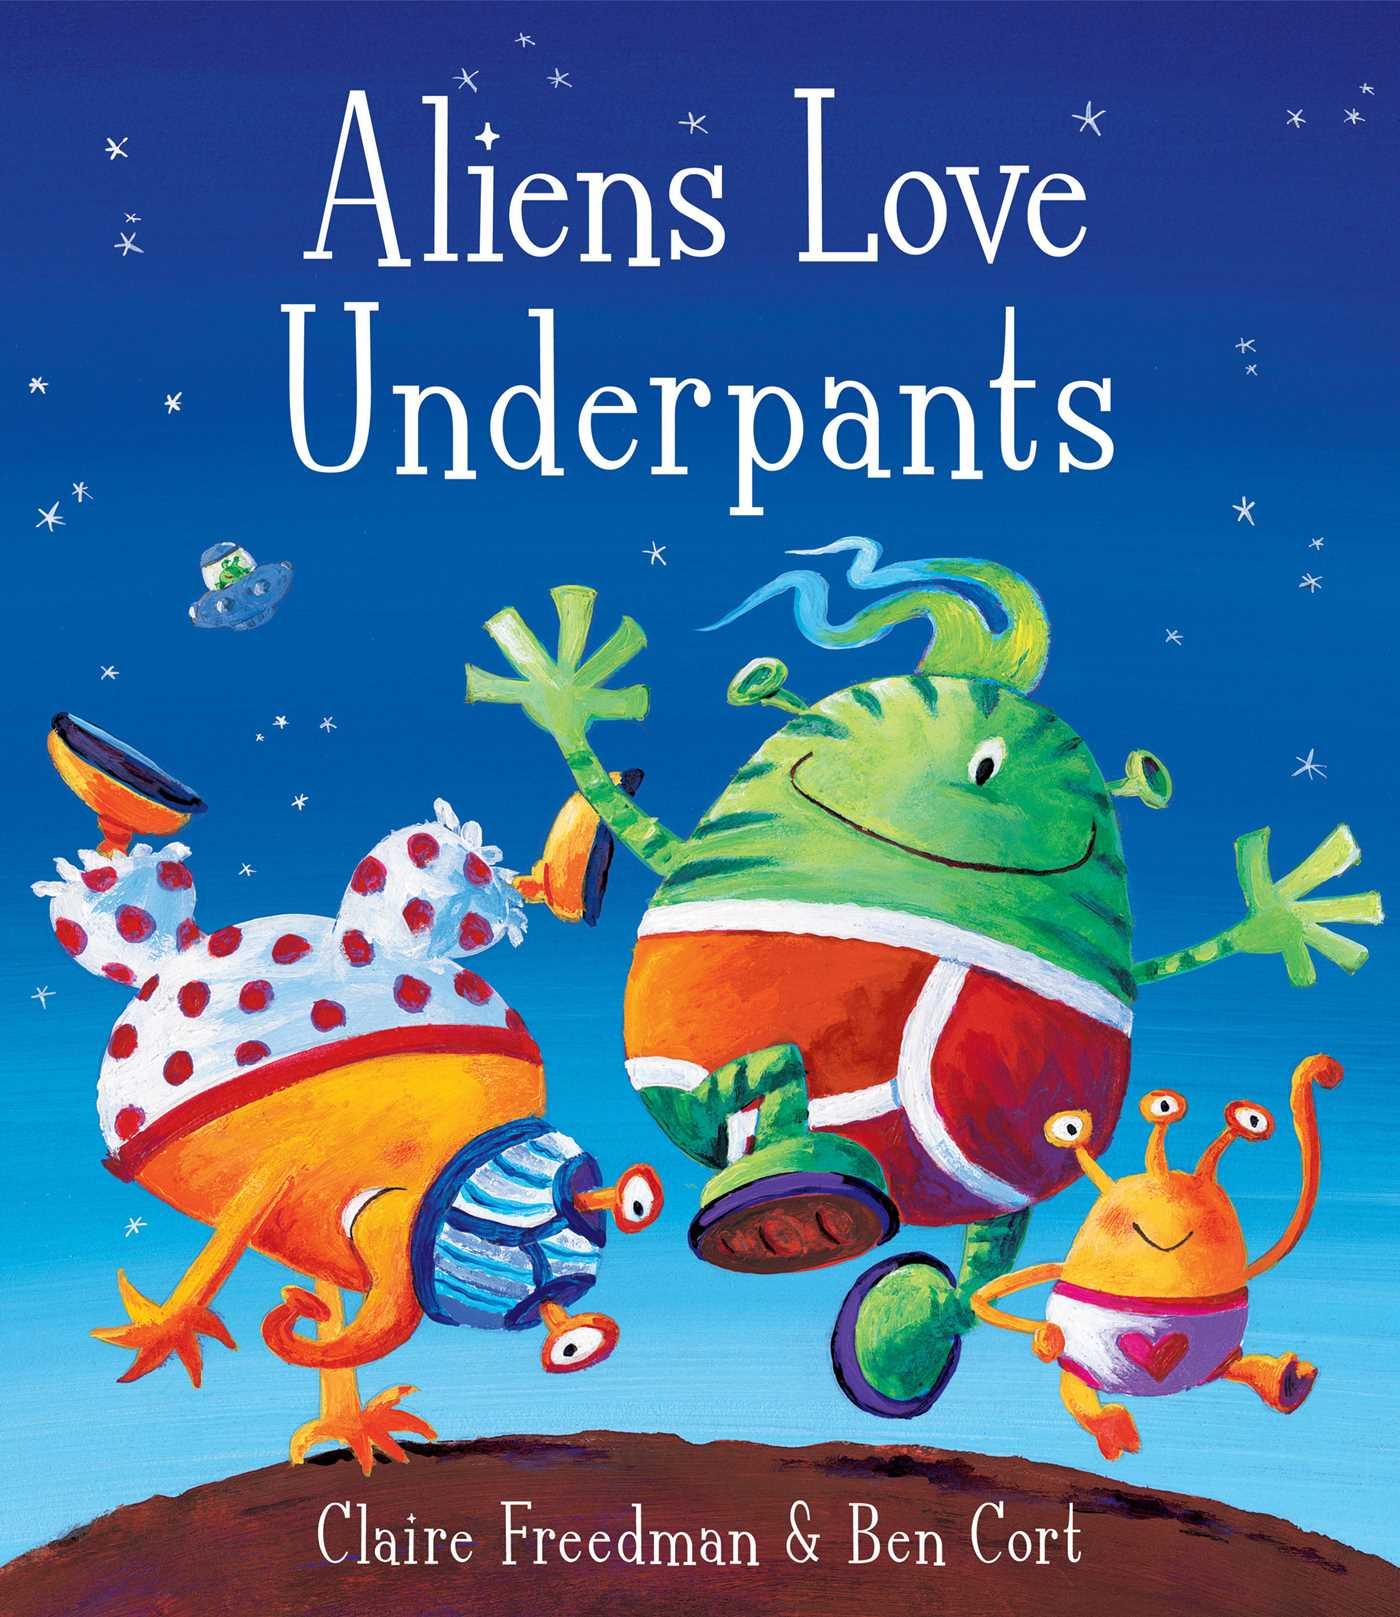 Aliens love underpants 9781416917052 hr